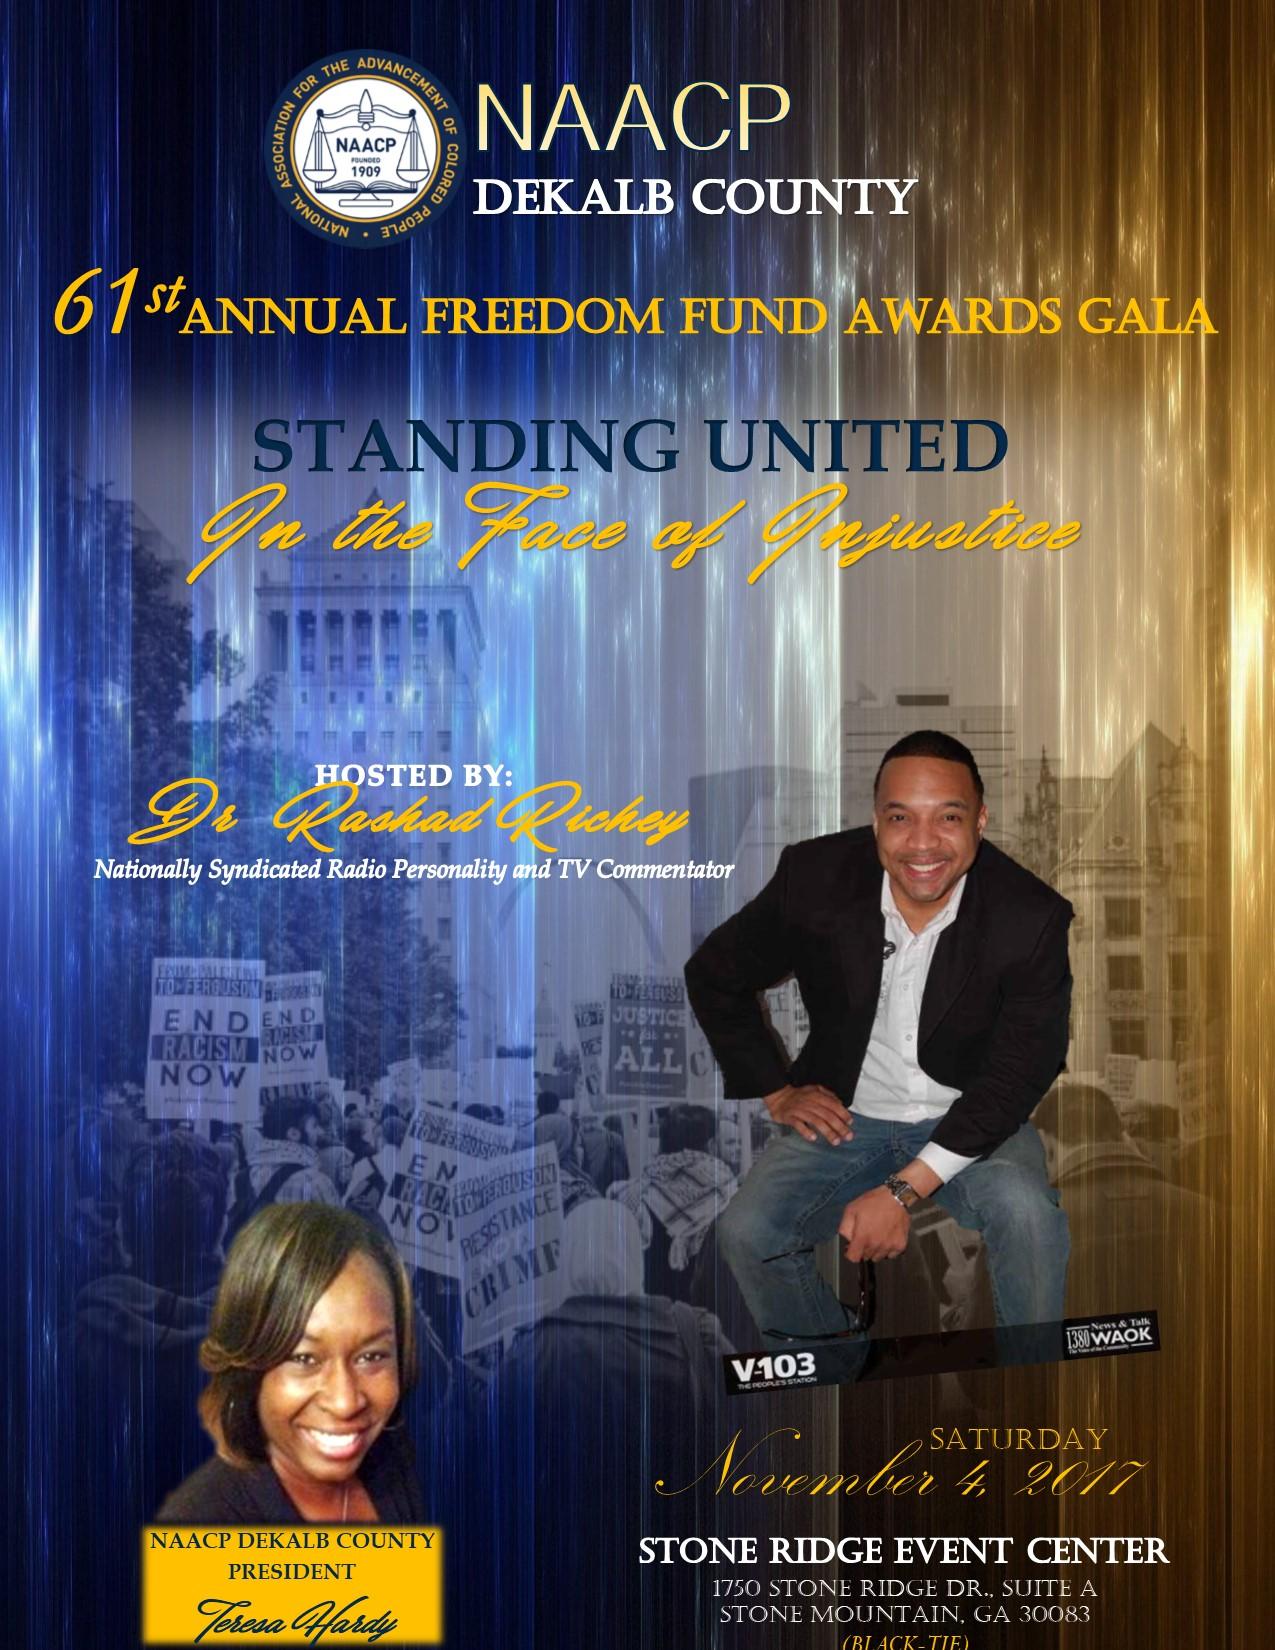 NAACP DeKalb County Freedom Fund Awards Gala